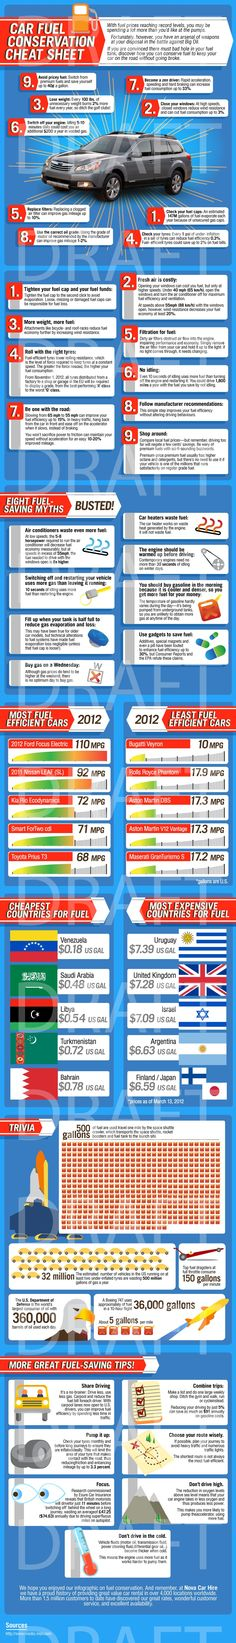 Great infographic on car fuel conservation. Great infographic on car fuel conservation. Car Facts, Car Care Tips, Car Fuel, Diy Car, Car Shop, Future Car, Car Detailing, Car Accessories, Infographic